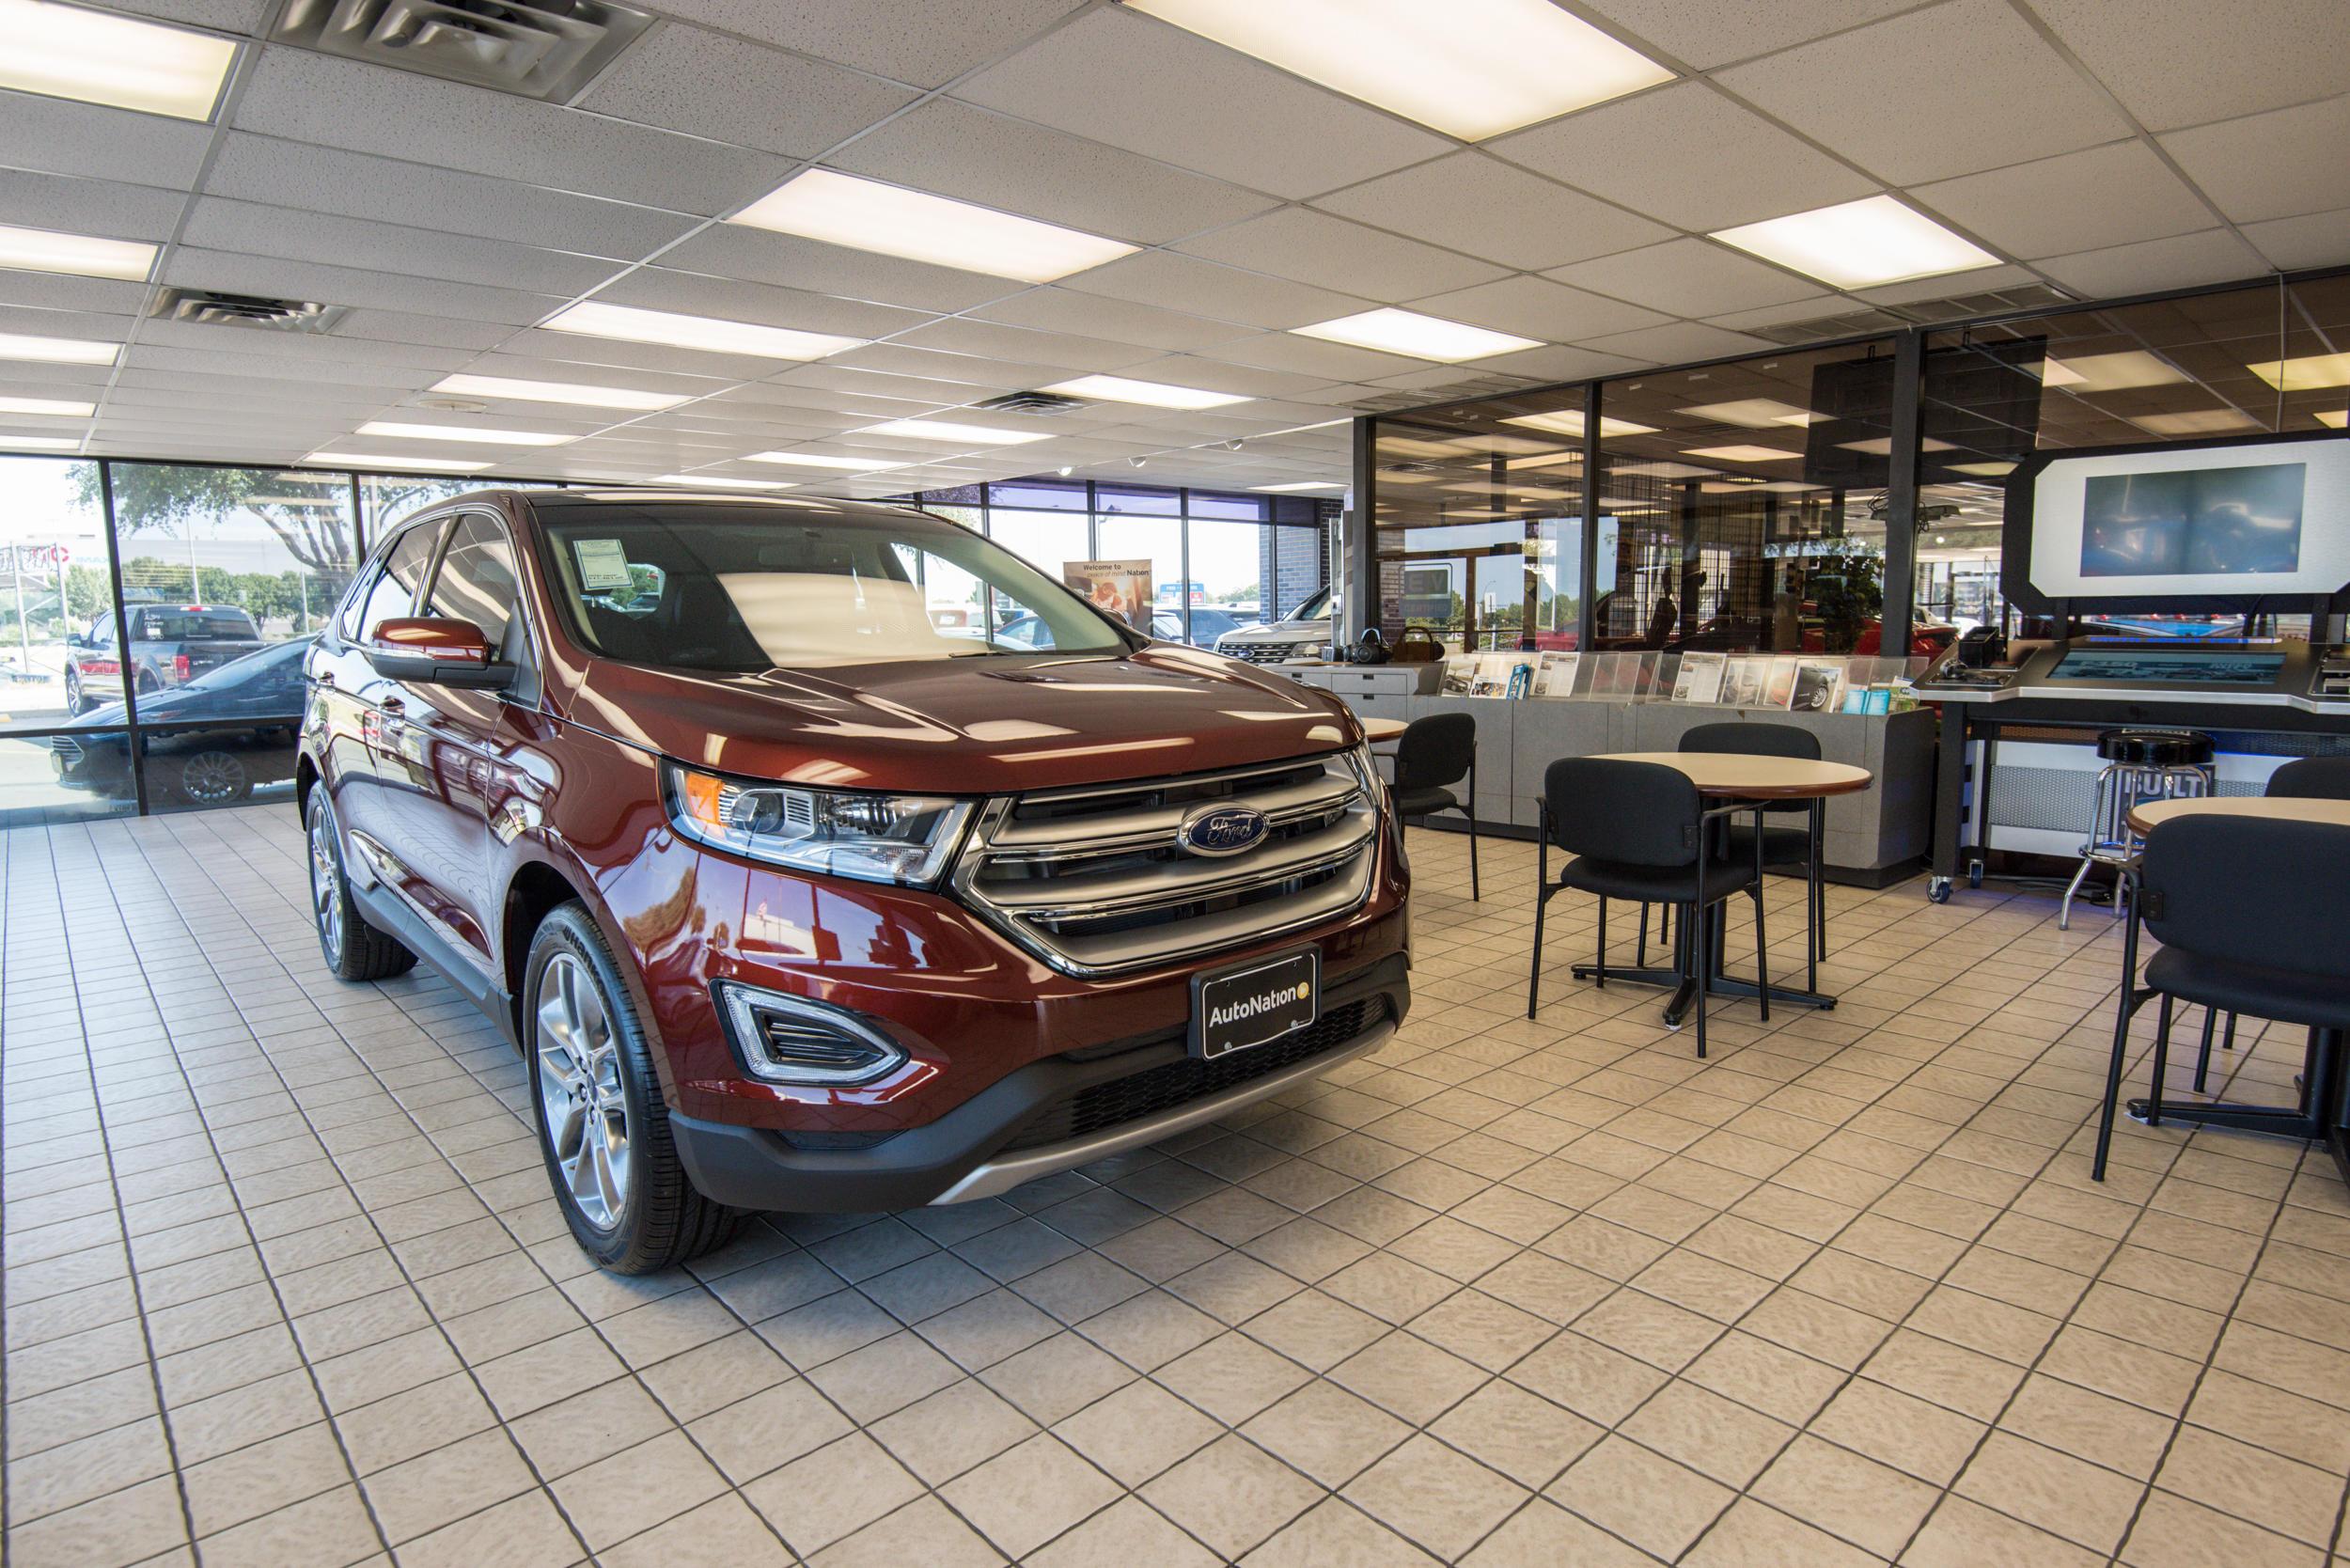 AutoNation Ford Arlington 1400 W Interstate 20 Arlington TX Autonation Ford  Fort Worth U003eu003e ...